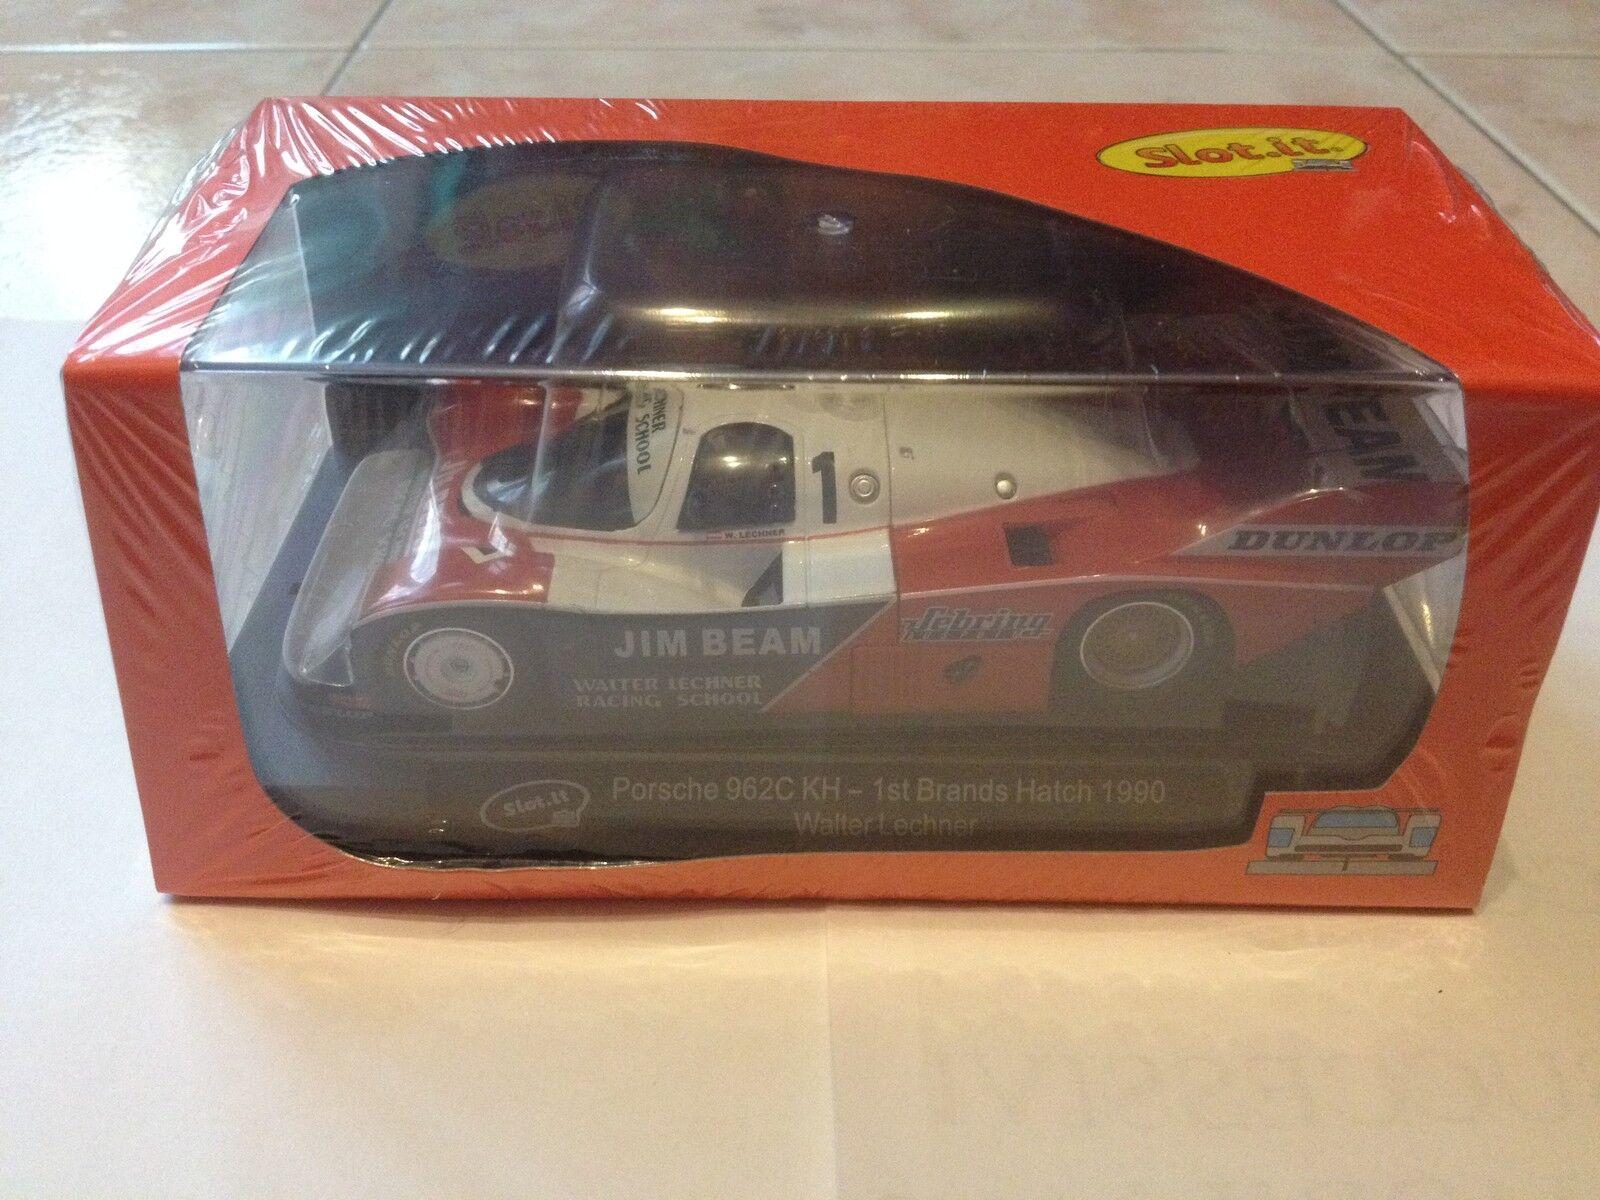 SLOT.IT Porsche 962C KH n.1 1st 1 32 Brands Hatch 1990 NOVELTY